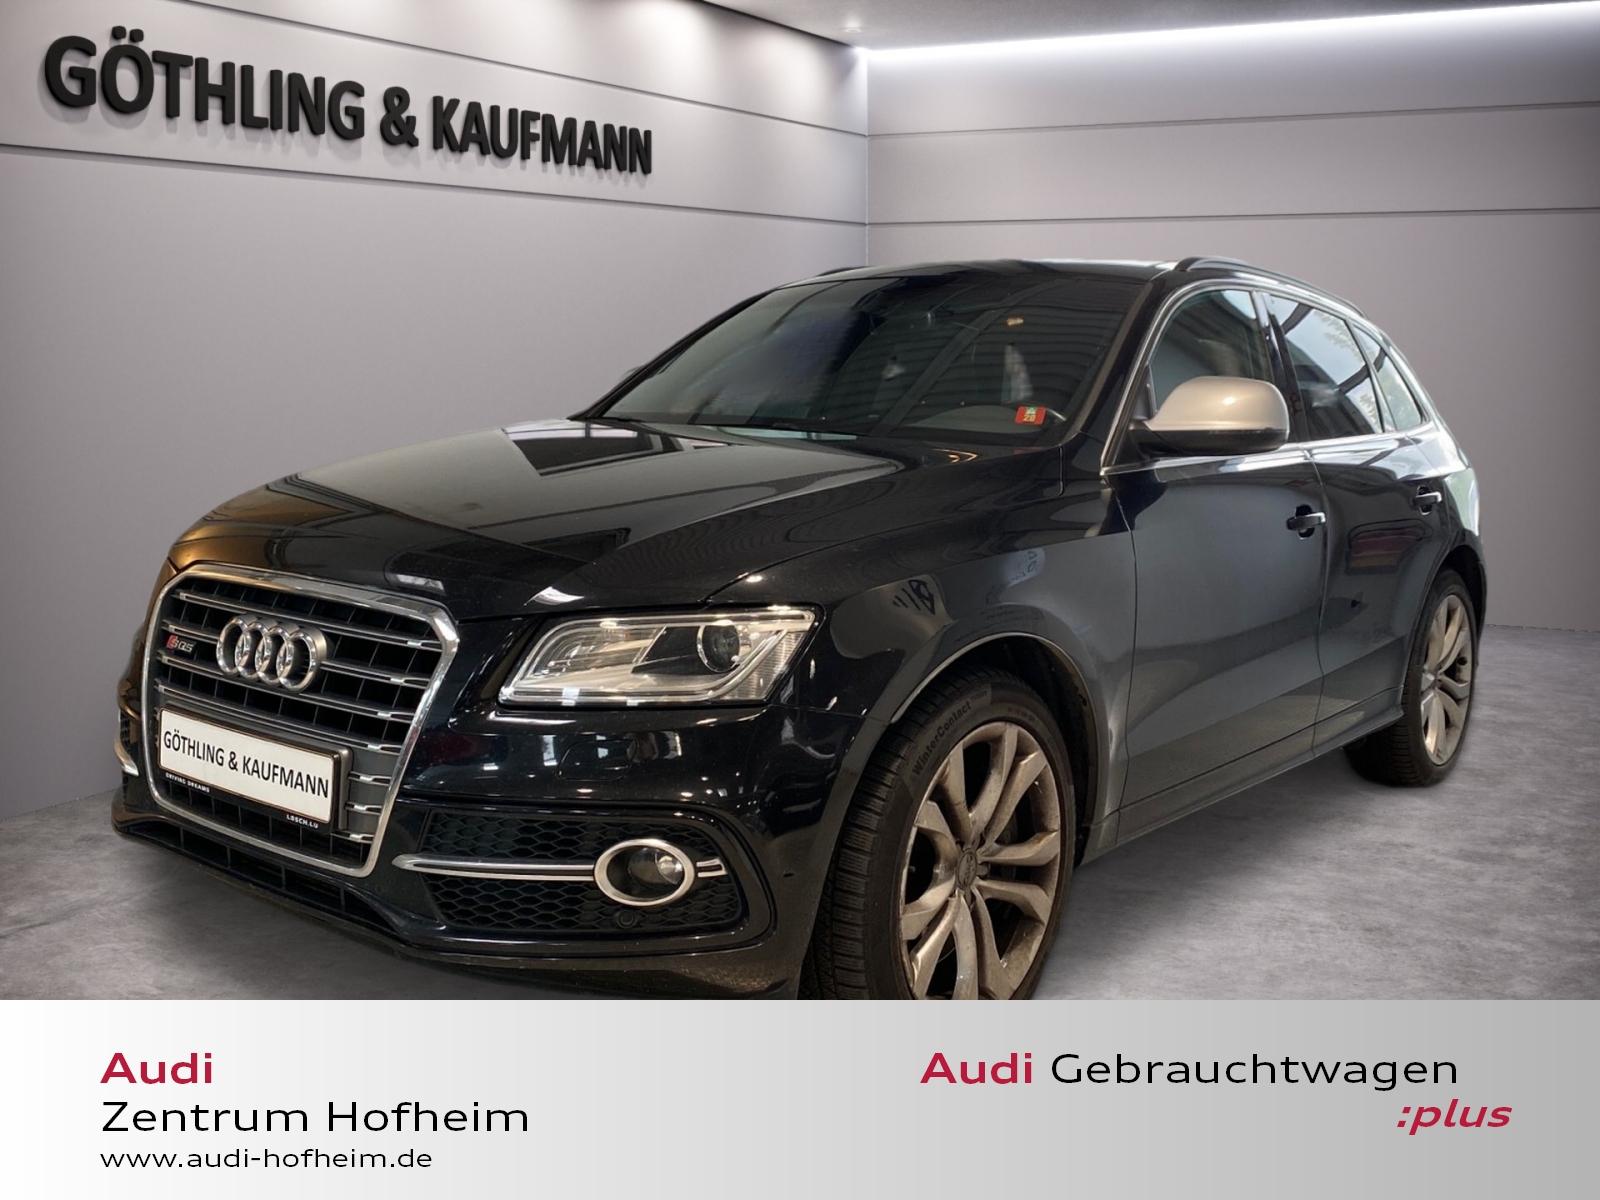 Audi SQ5 3.0 TDI*Xenon+*Pano*B&O*Carbon*Navi+*Memory*, Jahr 2014, Diesel